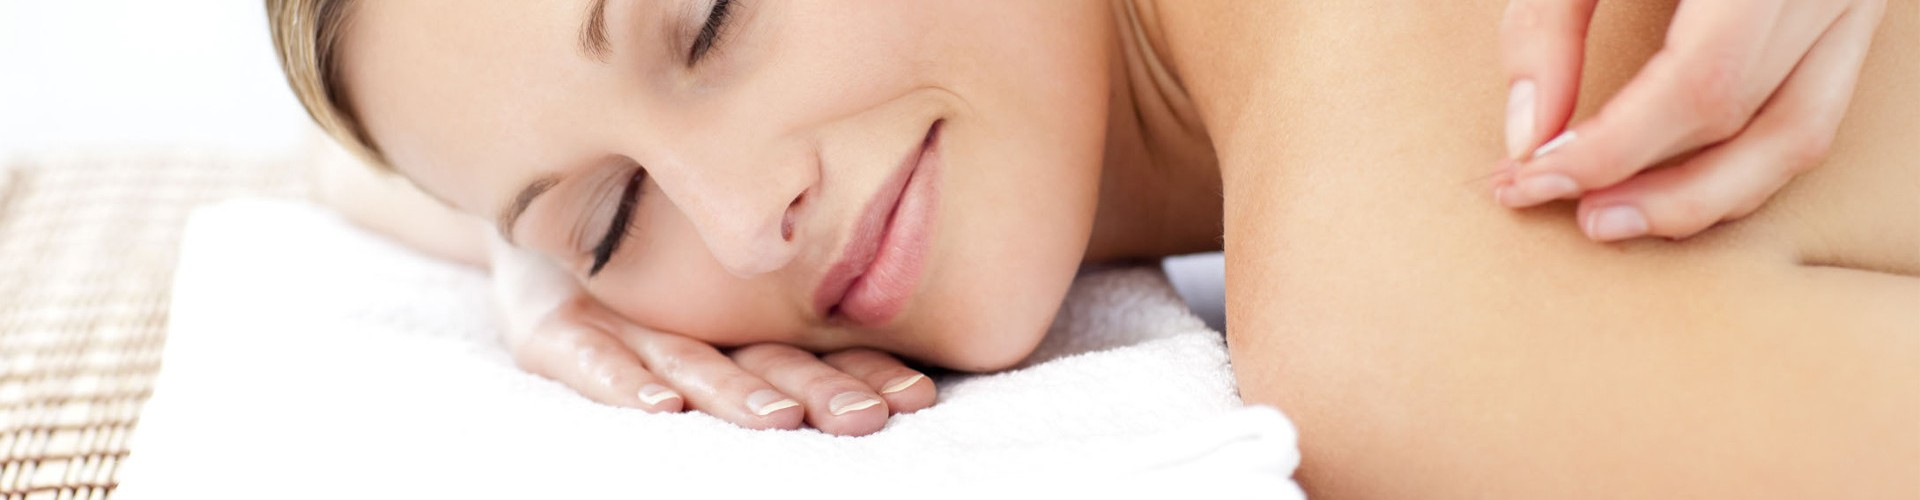 acupuntura clinica tarso murcia